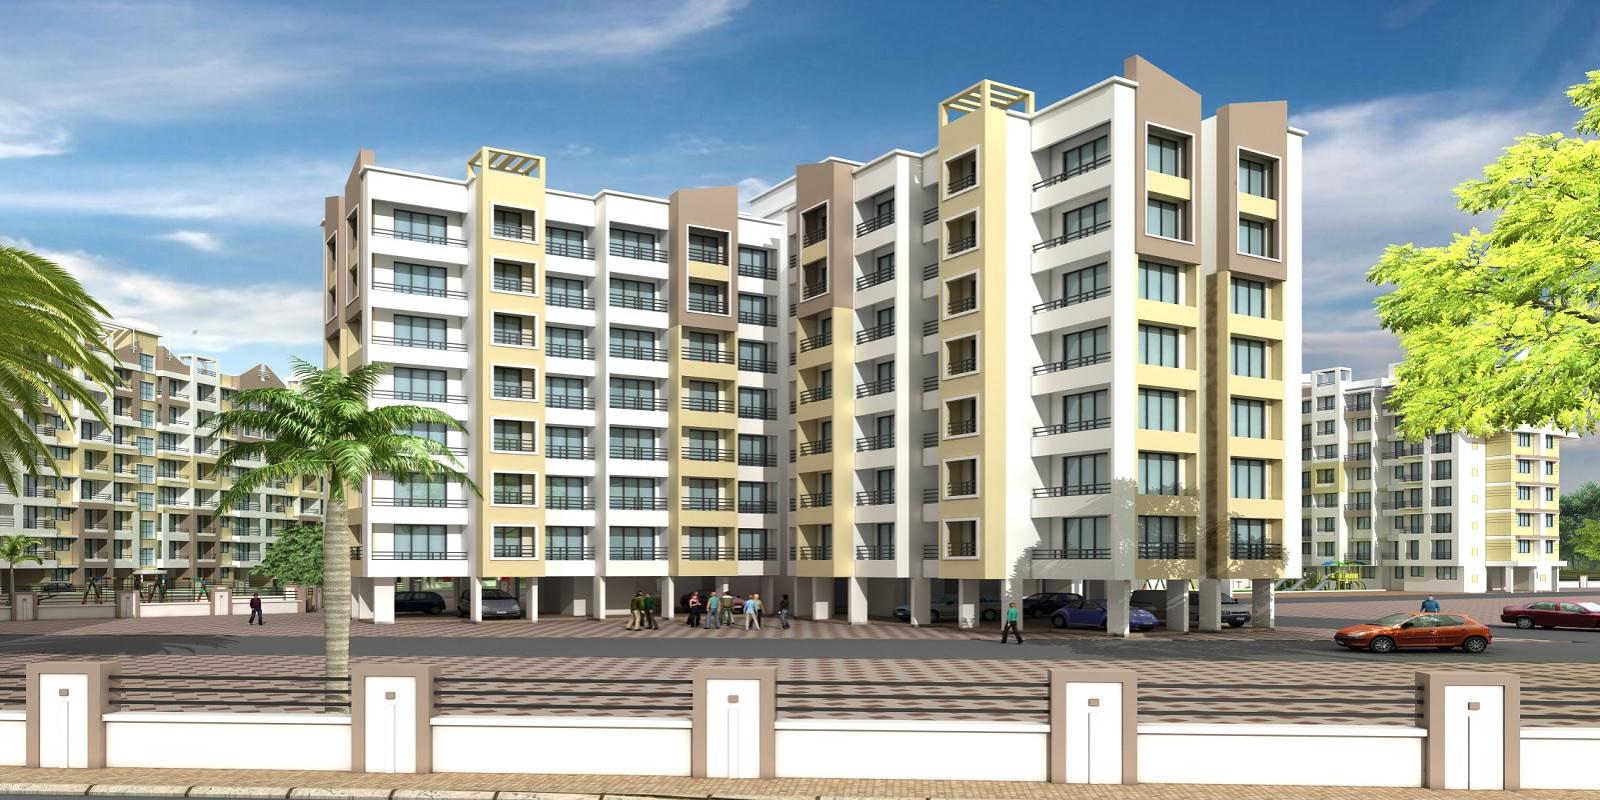 panvelkar realtors homes project project large image1